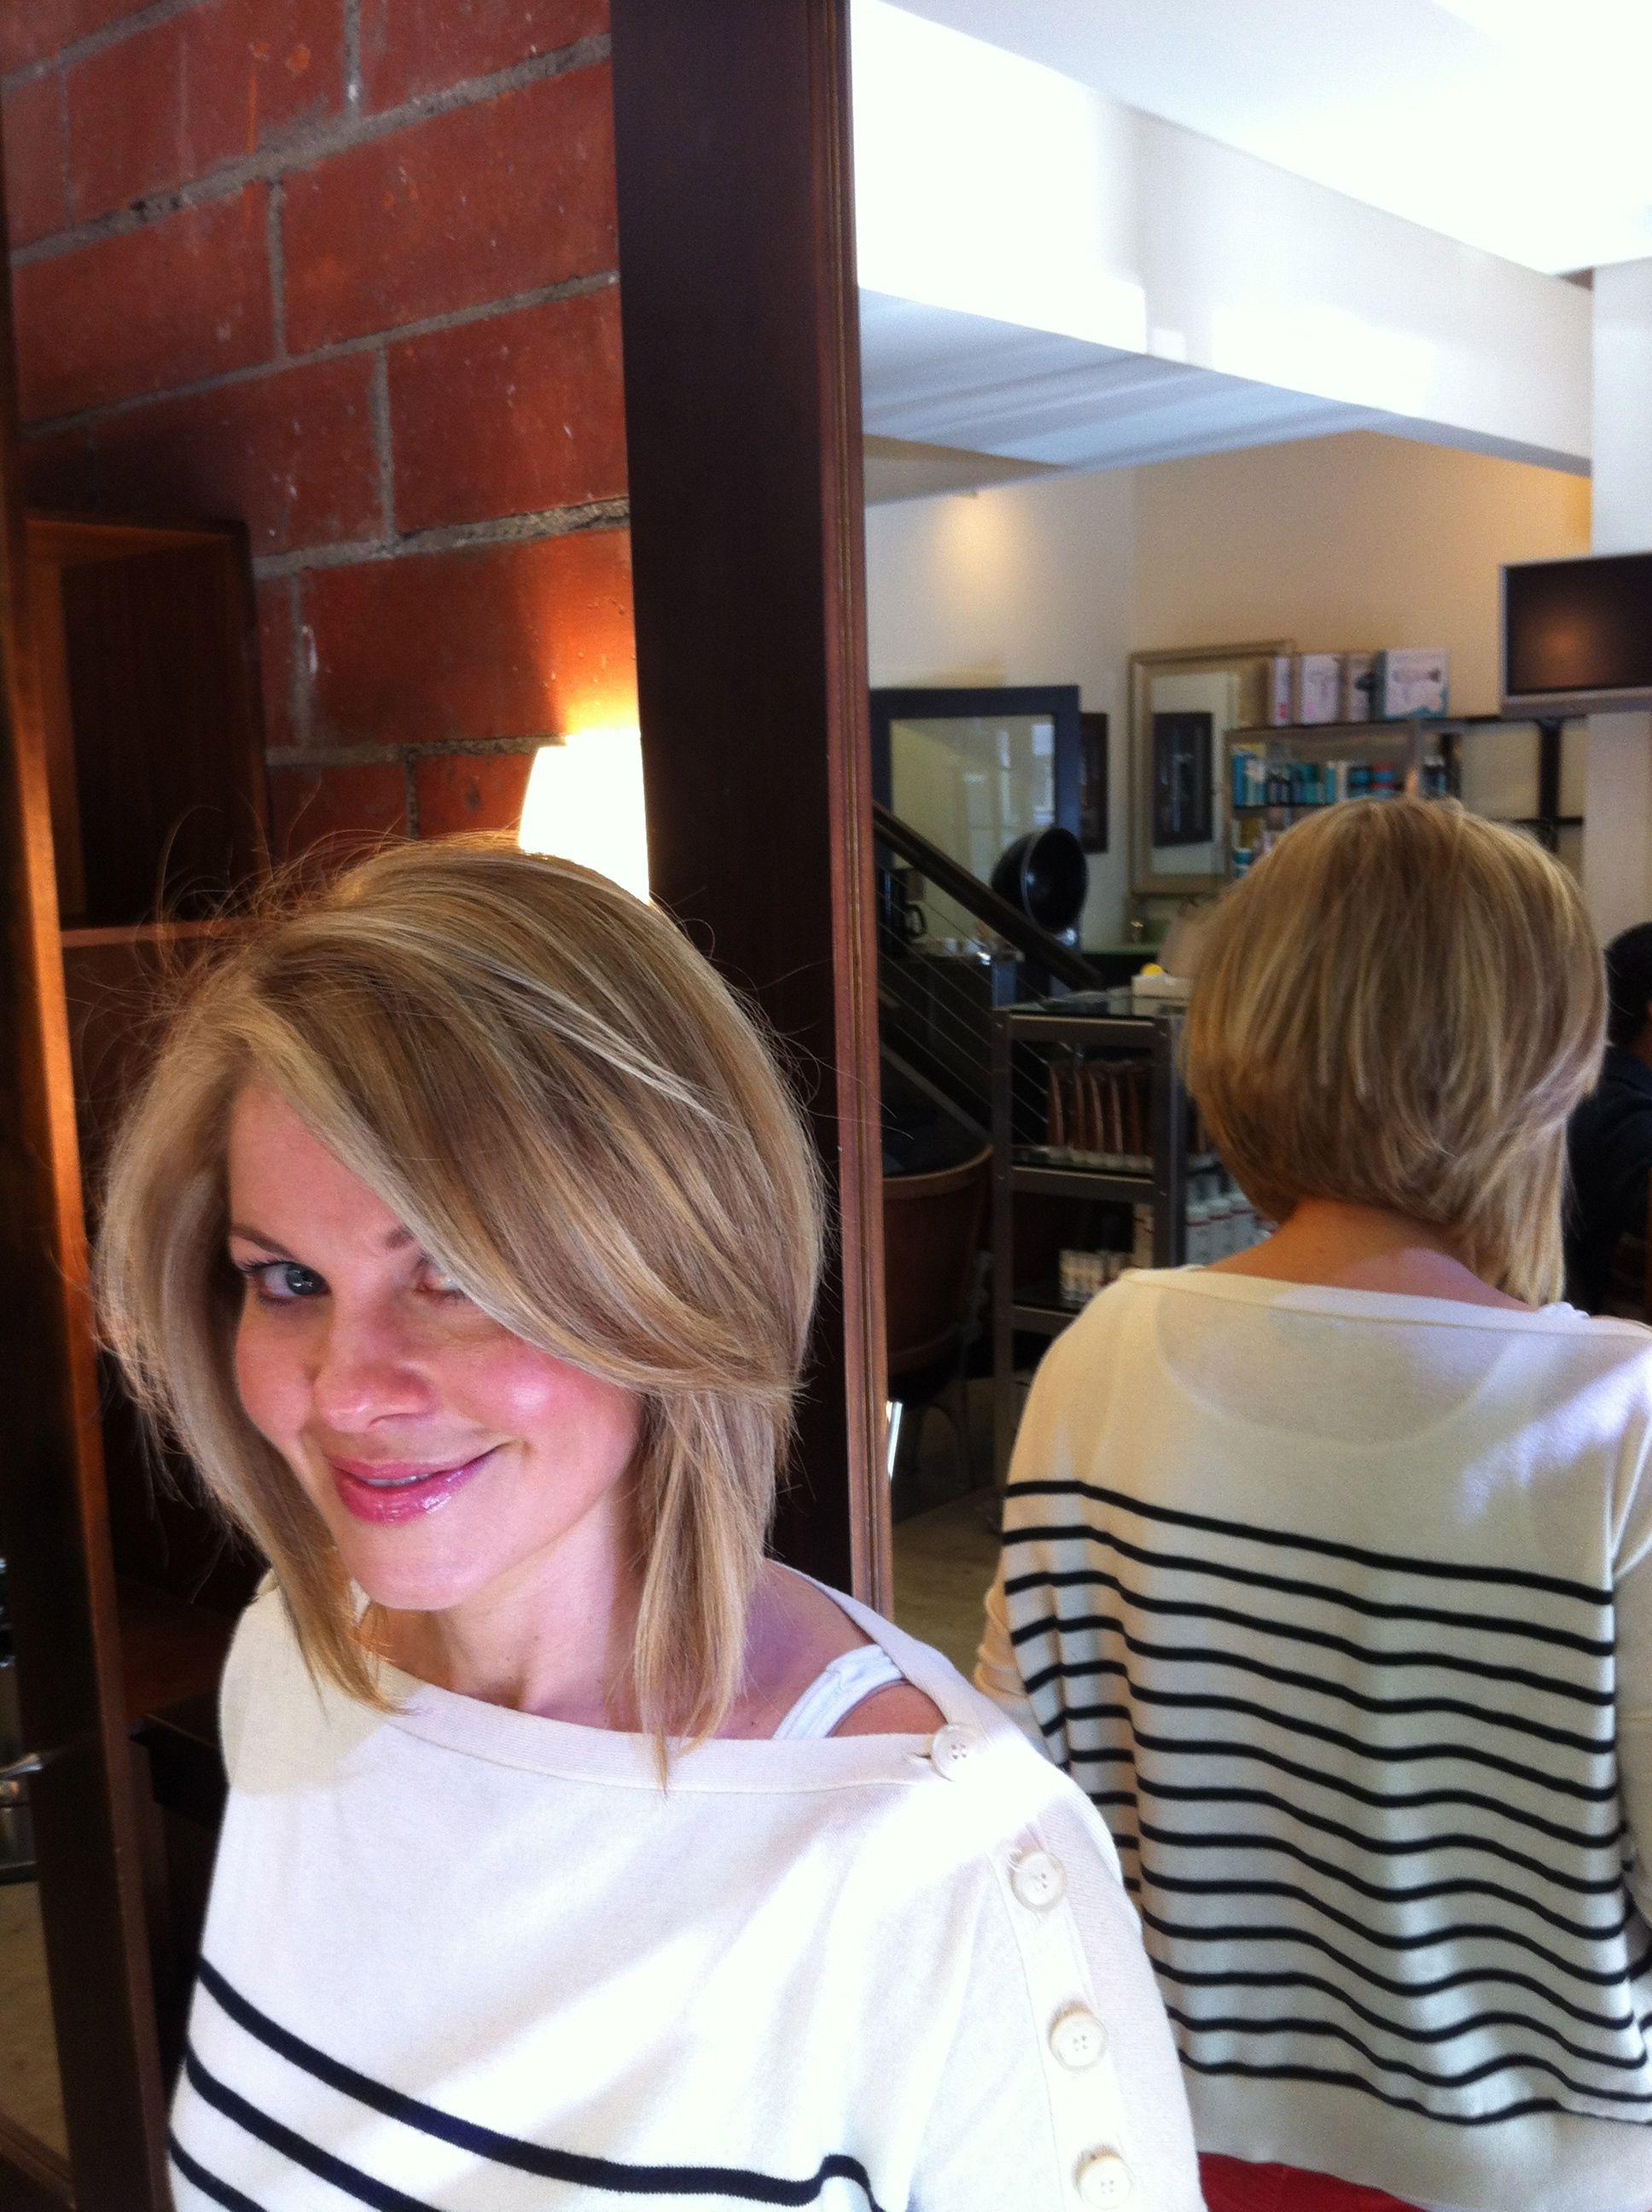 front and back | h a i r c u t | hair styles, hair cuts, hair